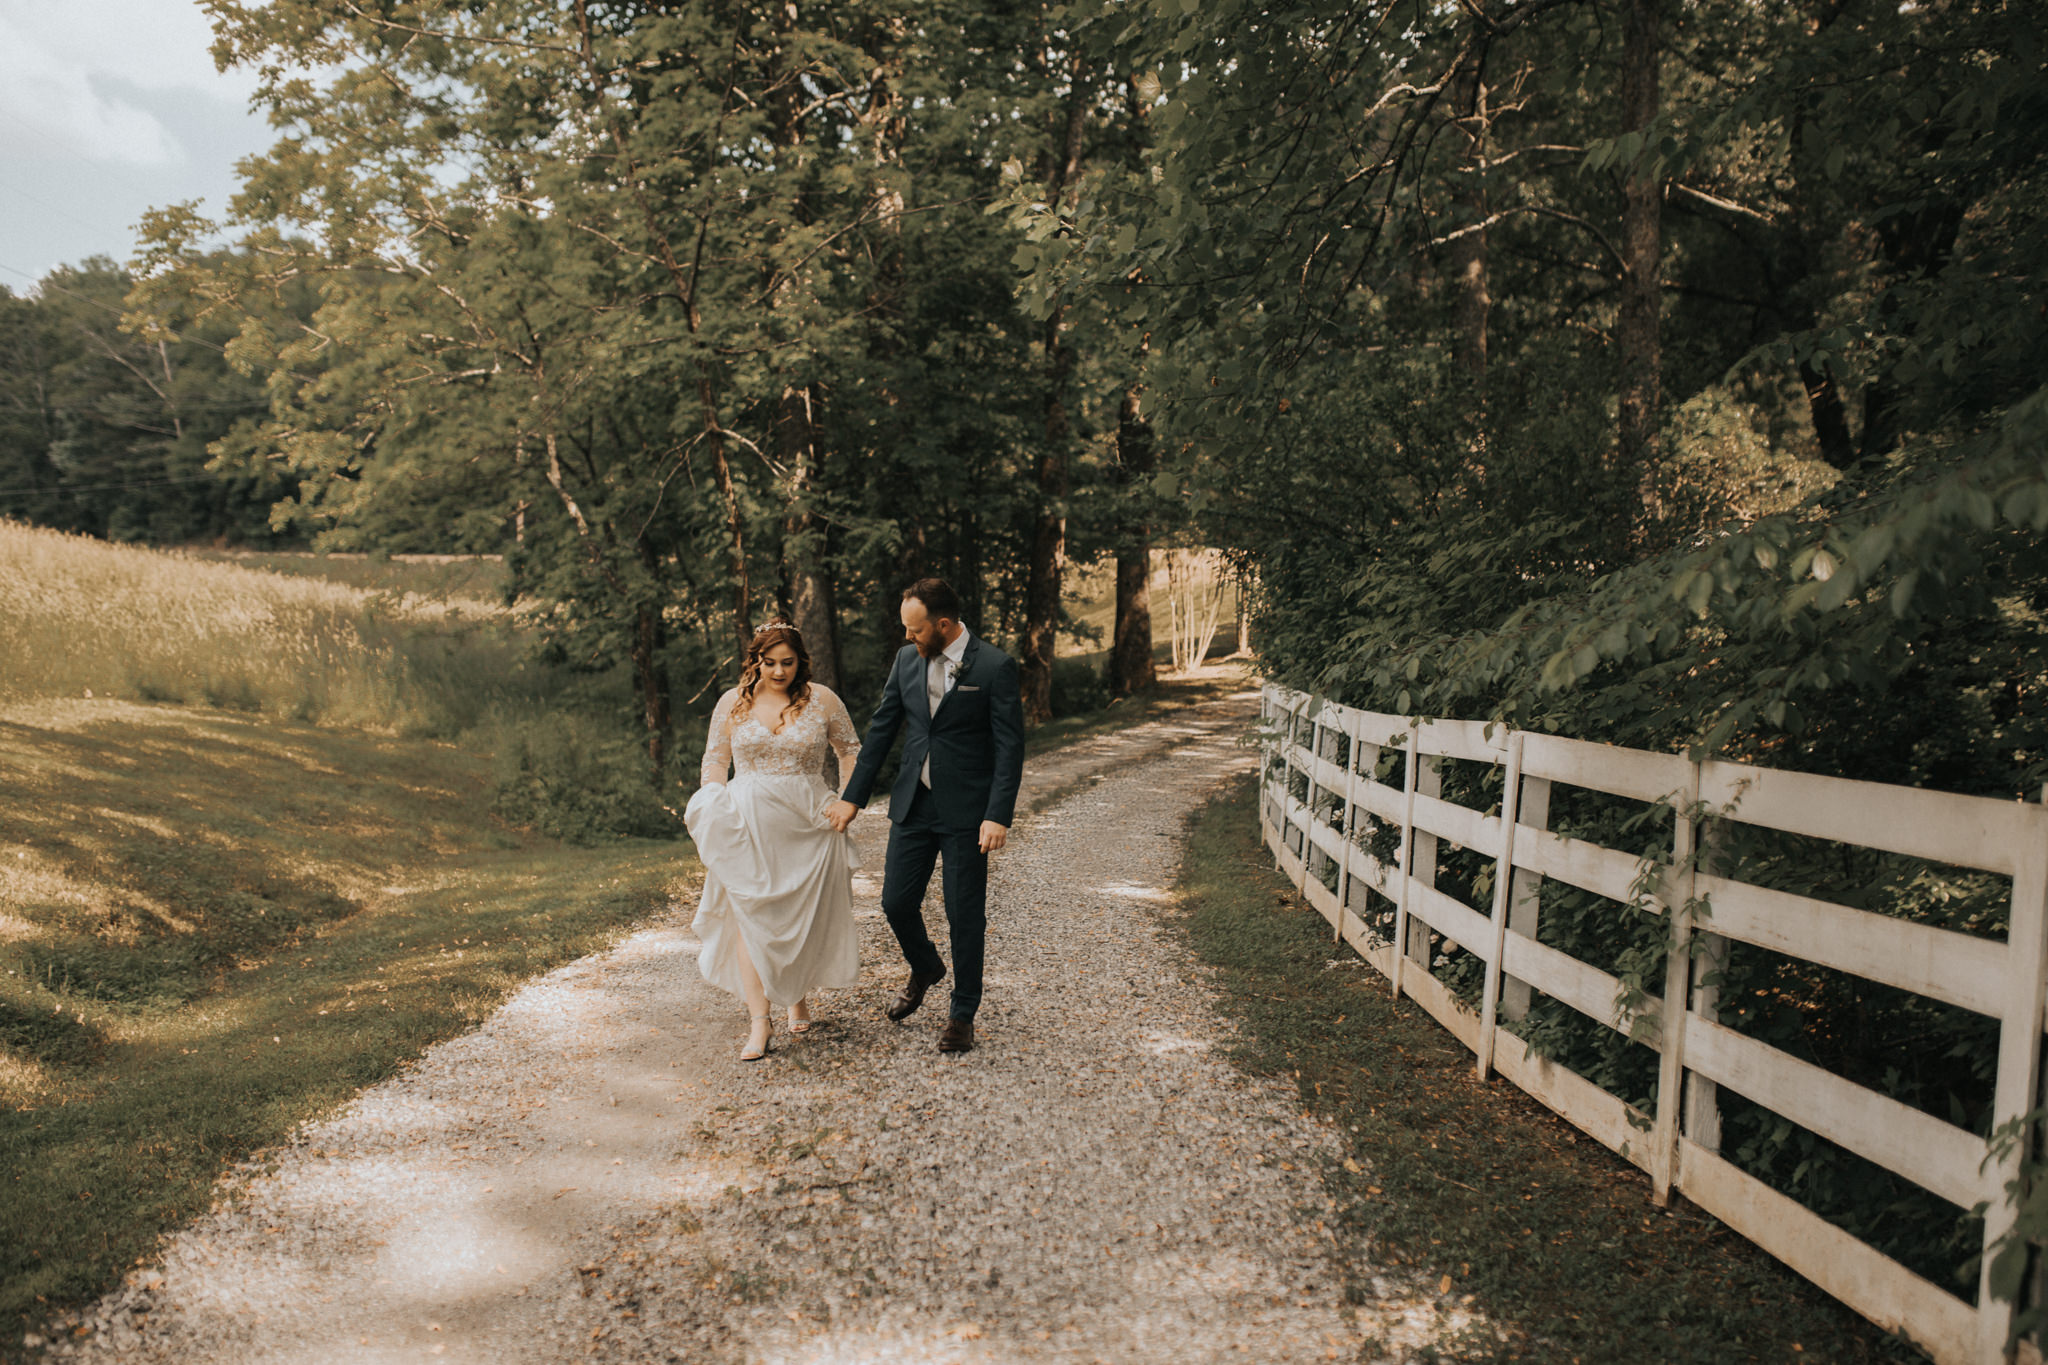 KateMatt-North-Georgia-Wedding-Photographer-Mountain-Laurel-Farm-47.jpg